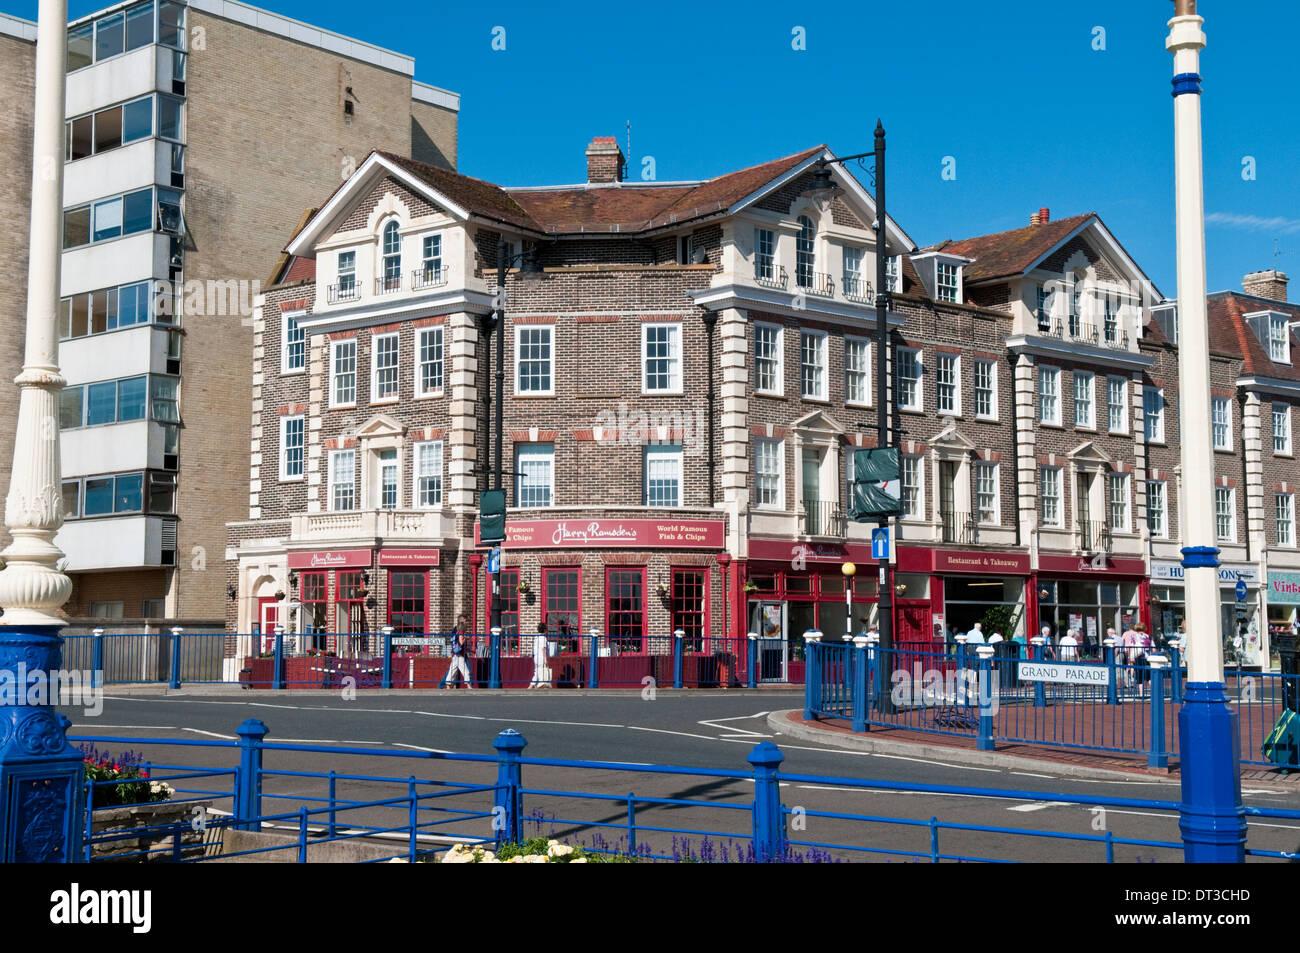 Harry Ramsden's fish restaurant on Eastbourne seafront, UK Stock Photo